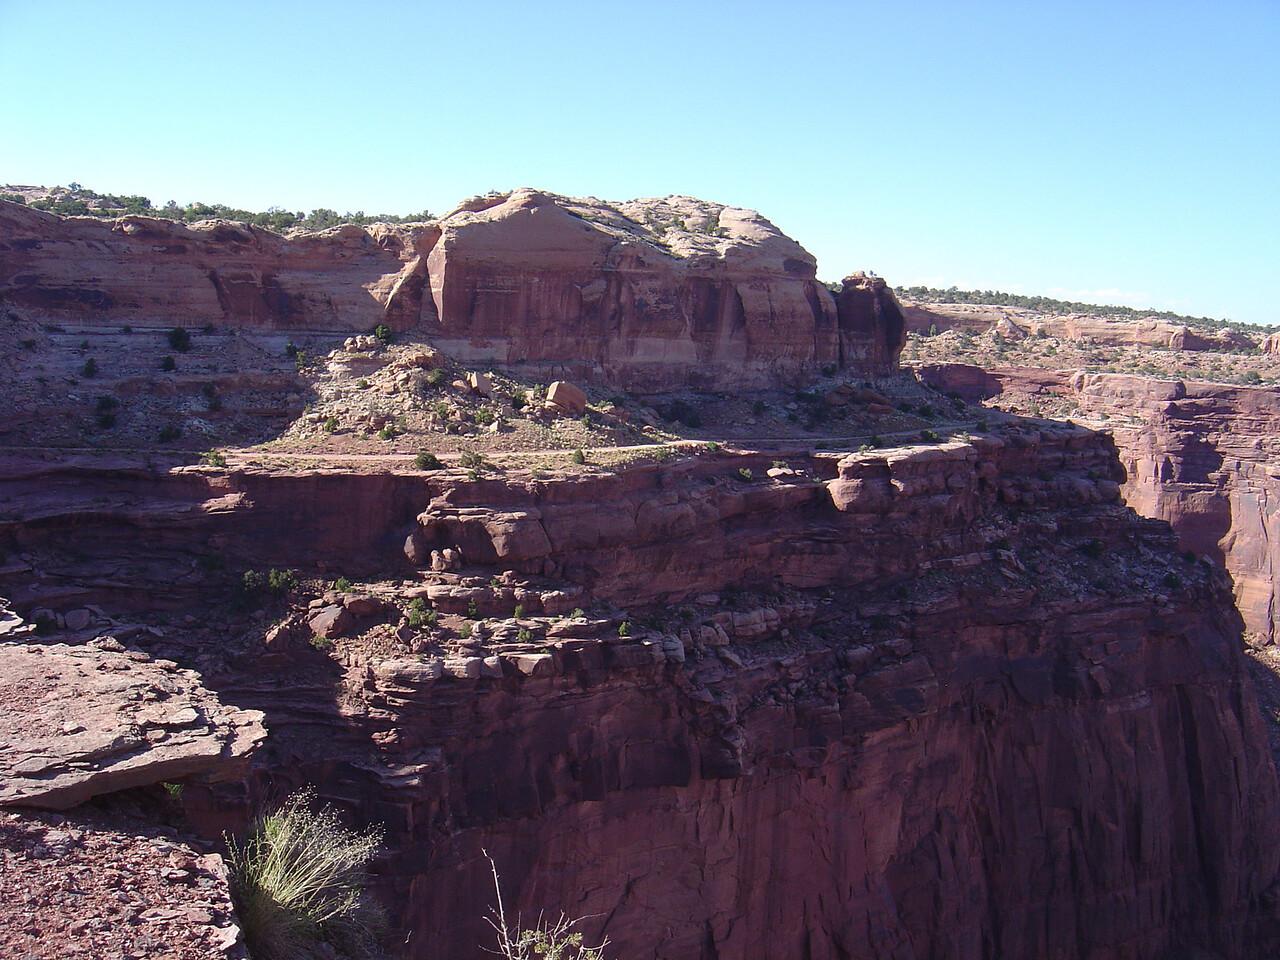 White Rim road along edge of canyon.